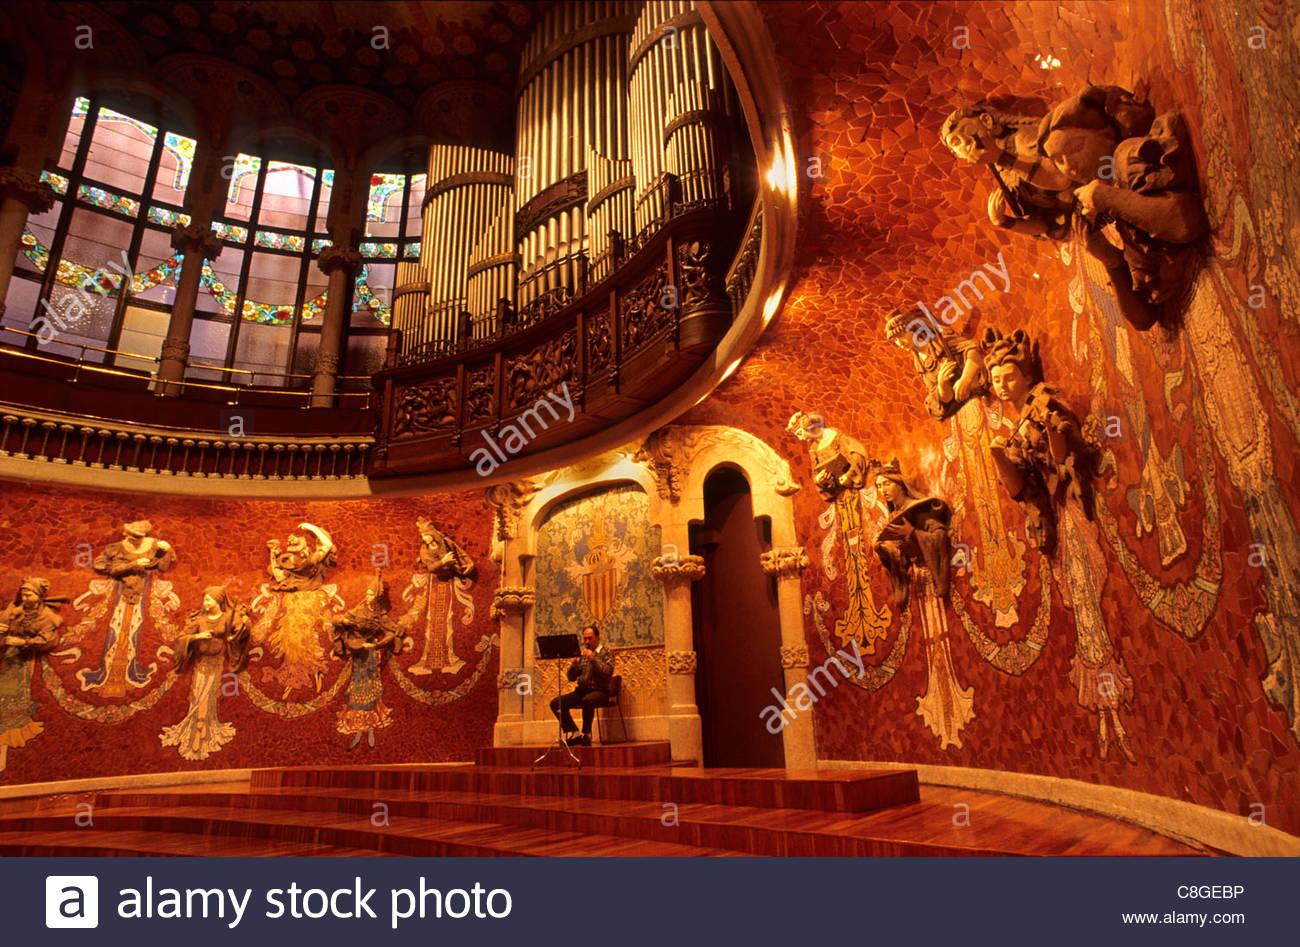 En el interior del Palau de la Música Catalana. Imagen De Stock